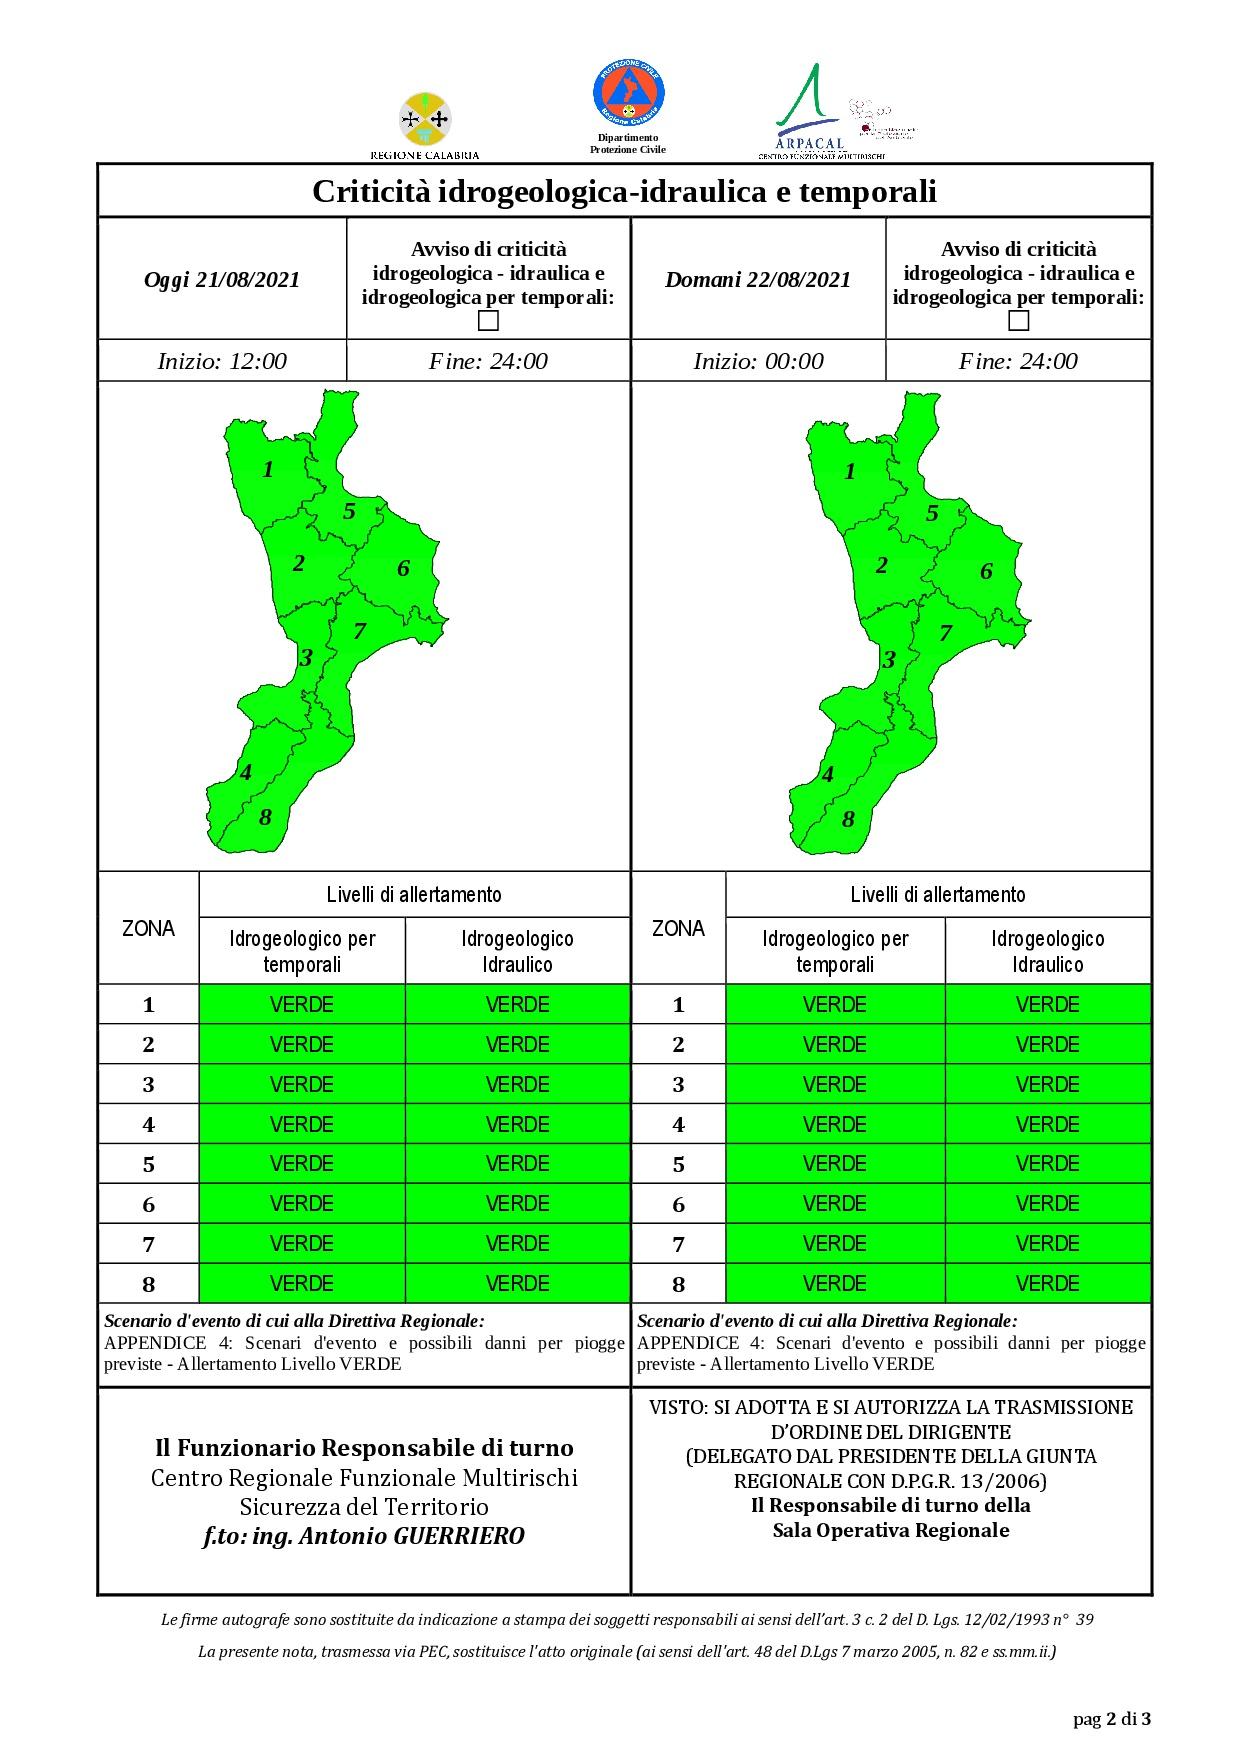 Criticità idrogeologica-idraulica e temporali in Calabria 21-08-2021